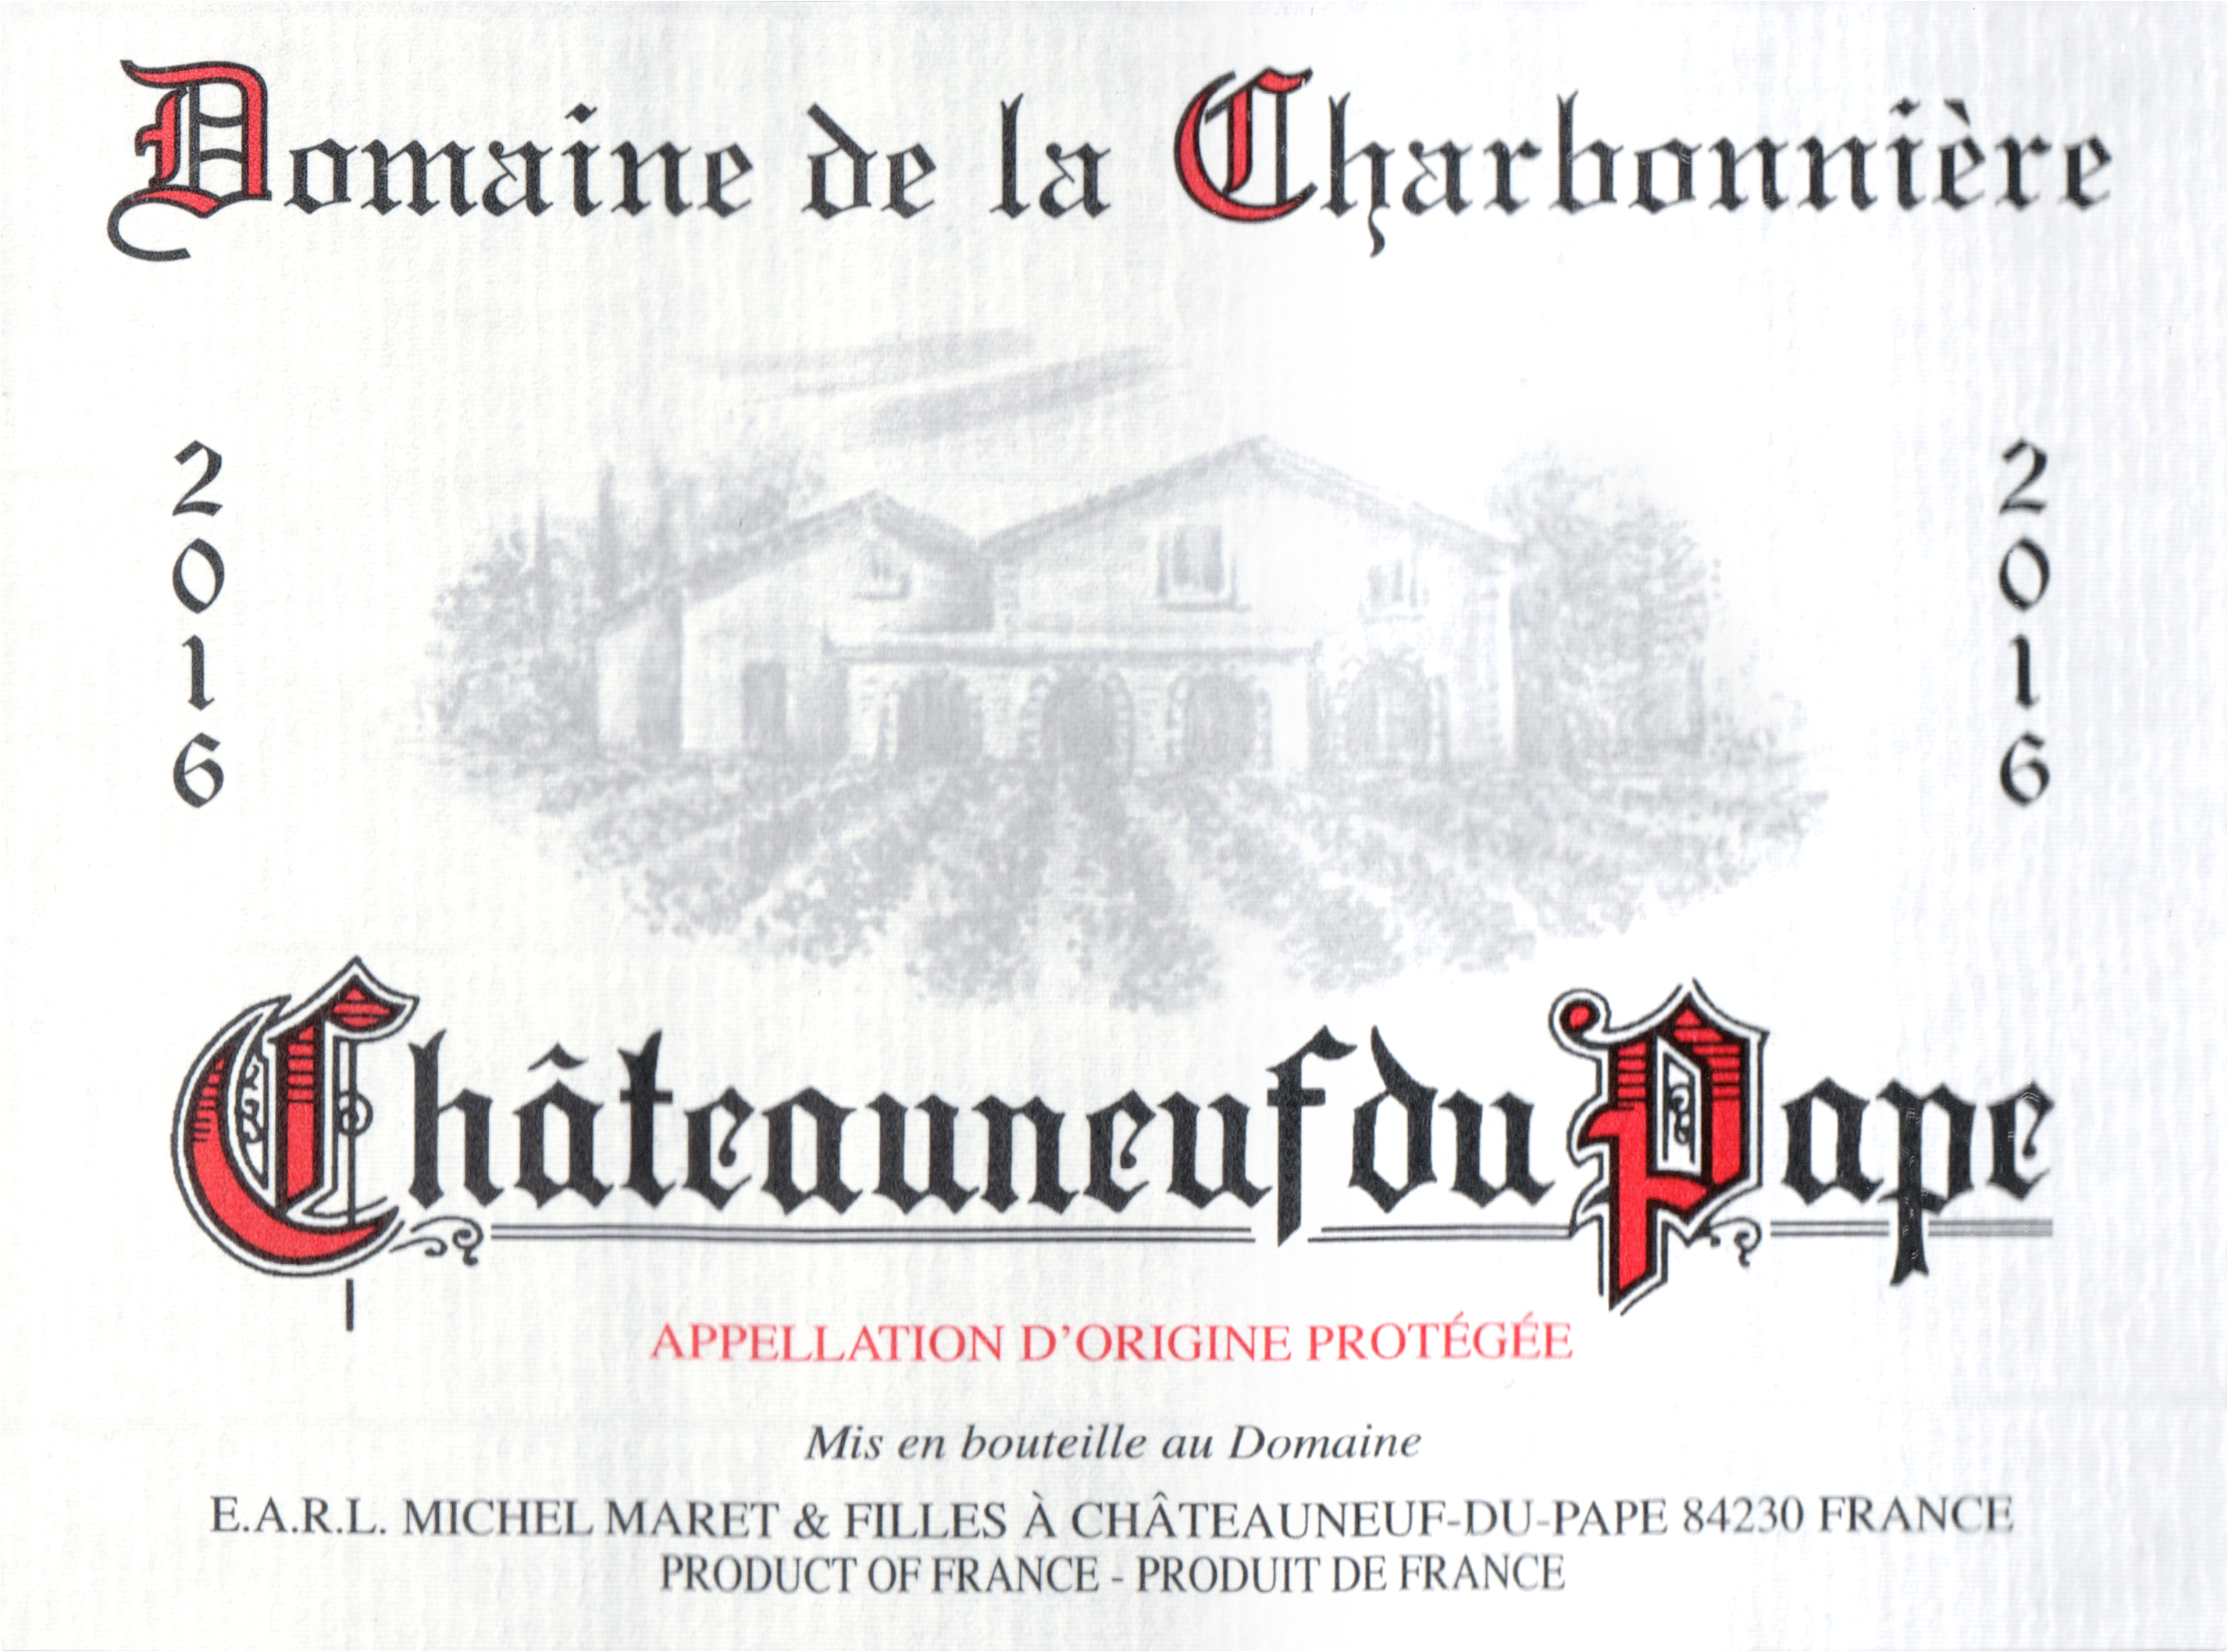 Charbonniere Tradition Chateauneuf Du Pape 2016